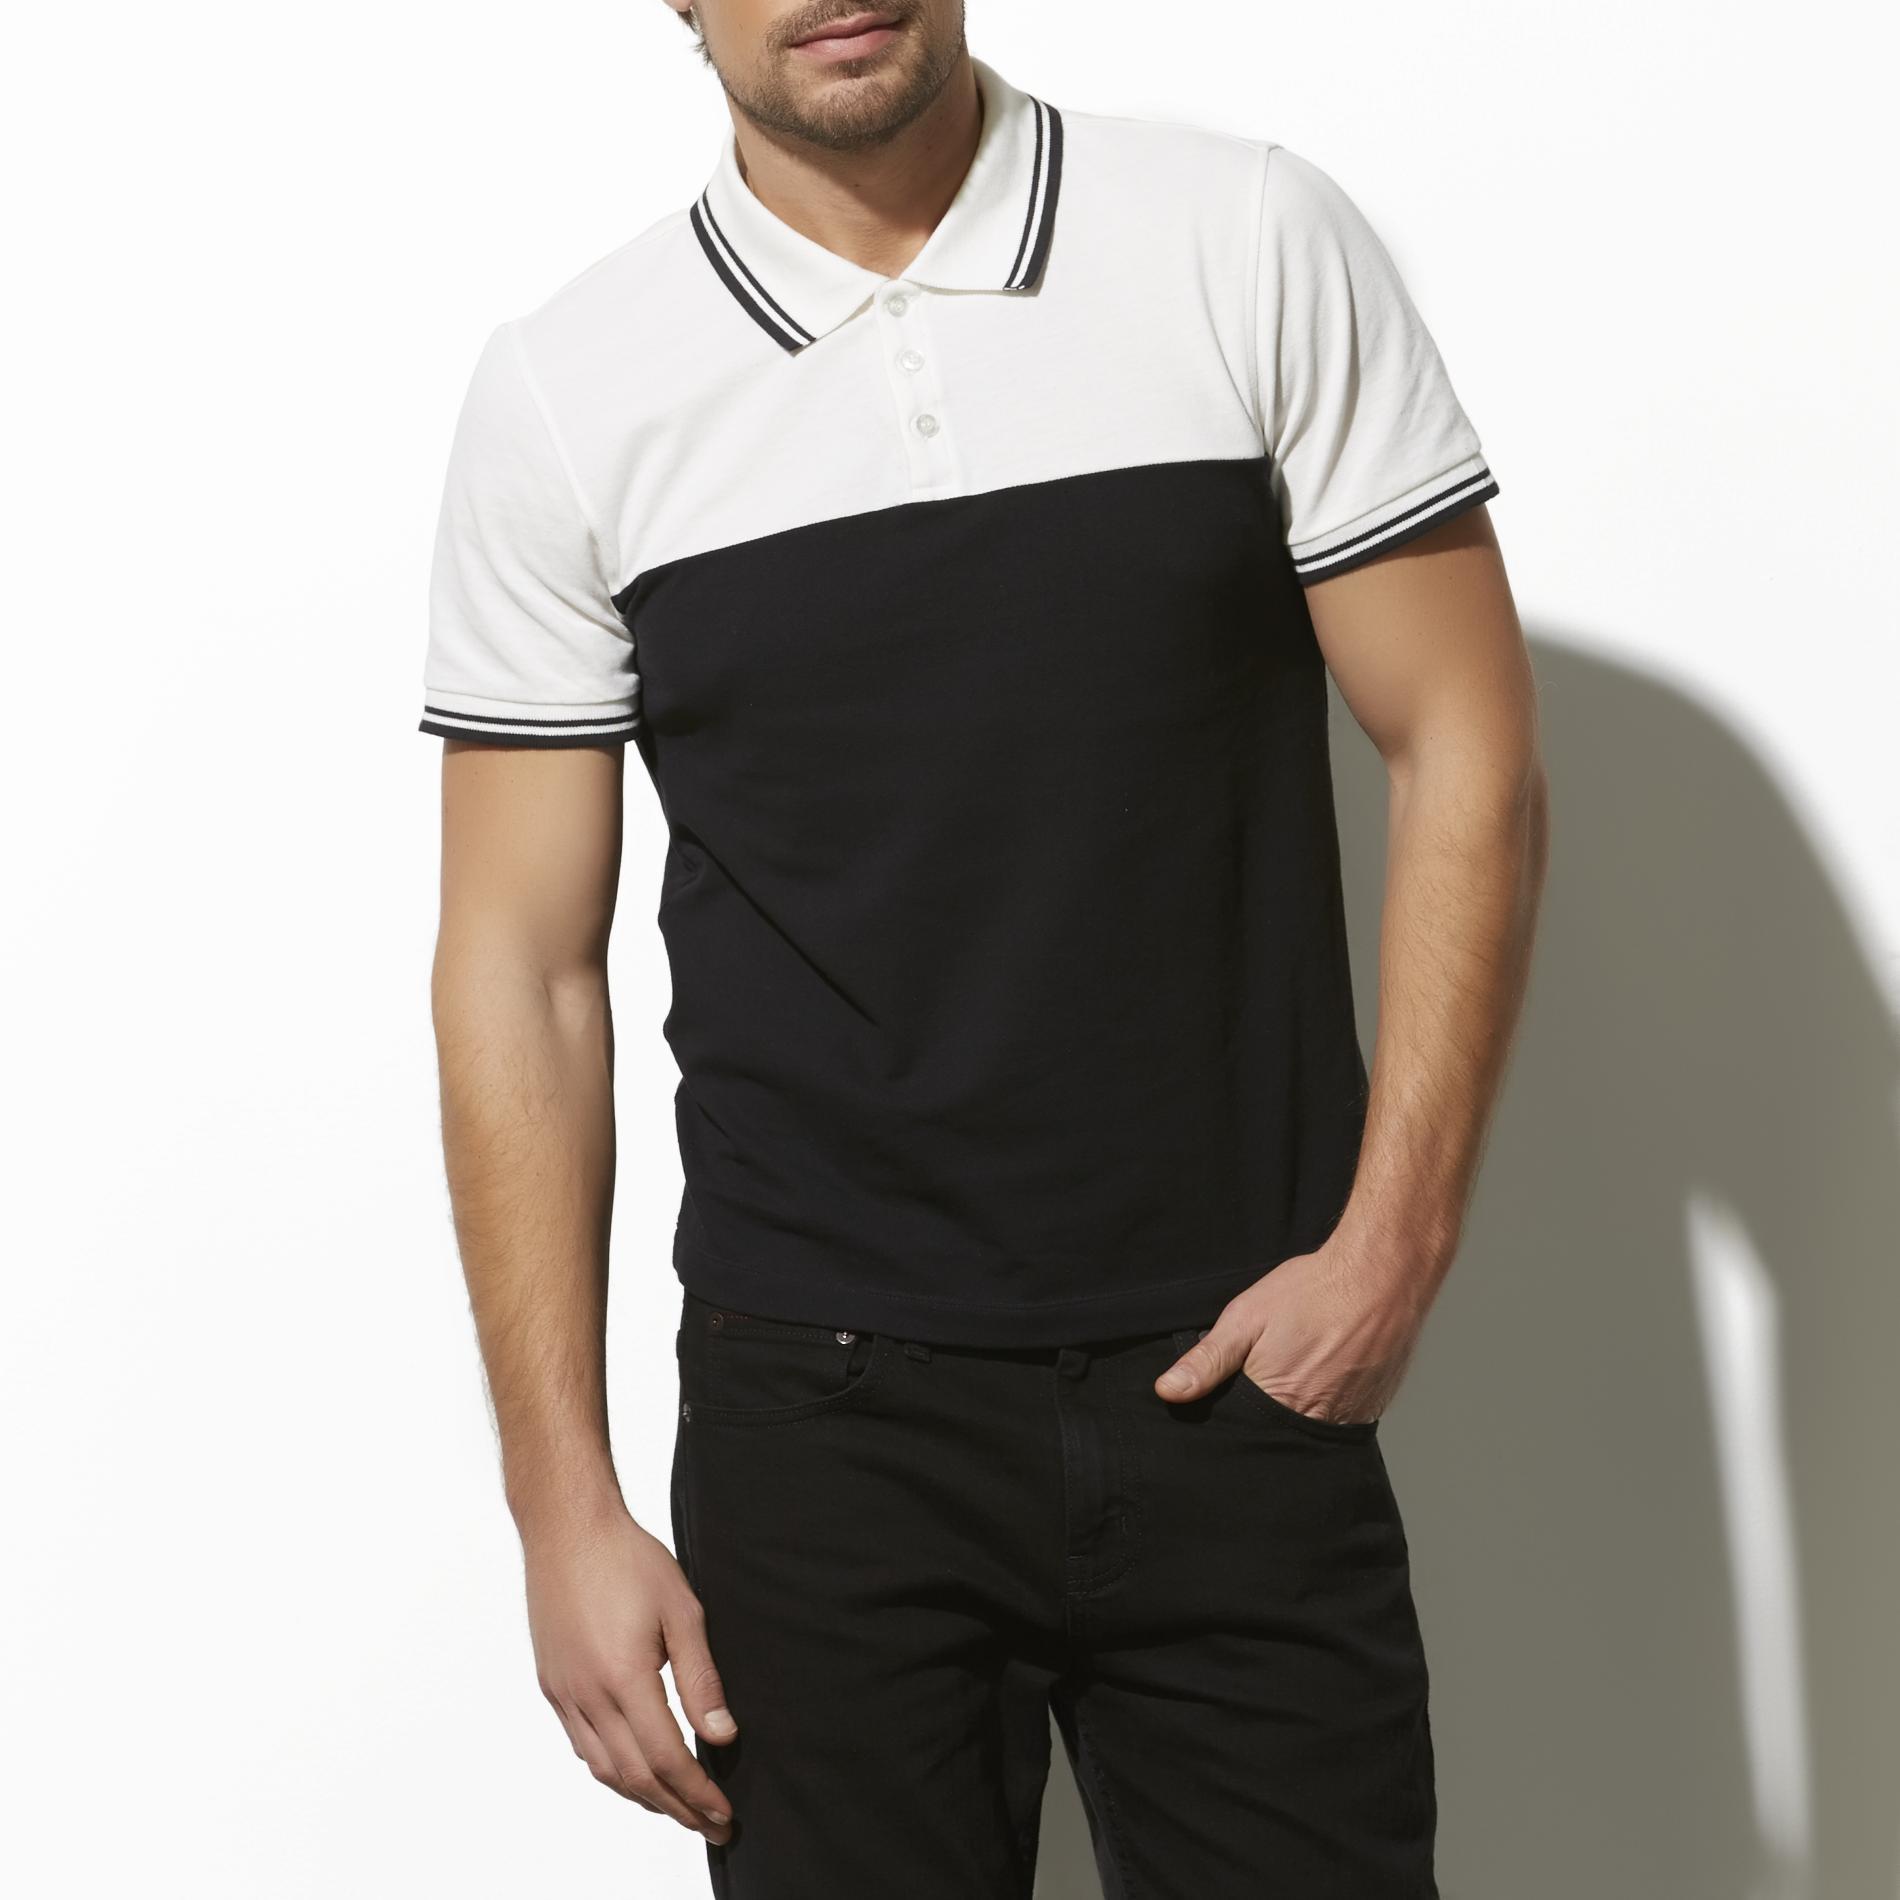 Adam Levine Men's Polo Shirt - Colorblock at Kmart.com